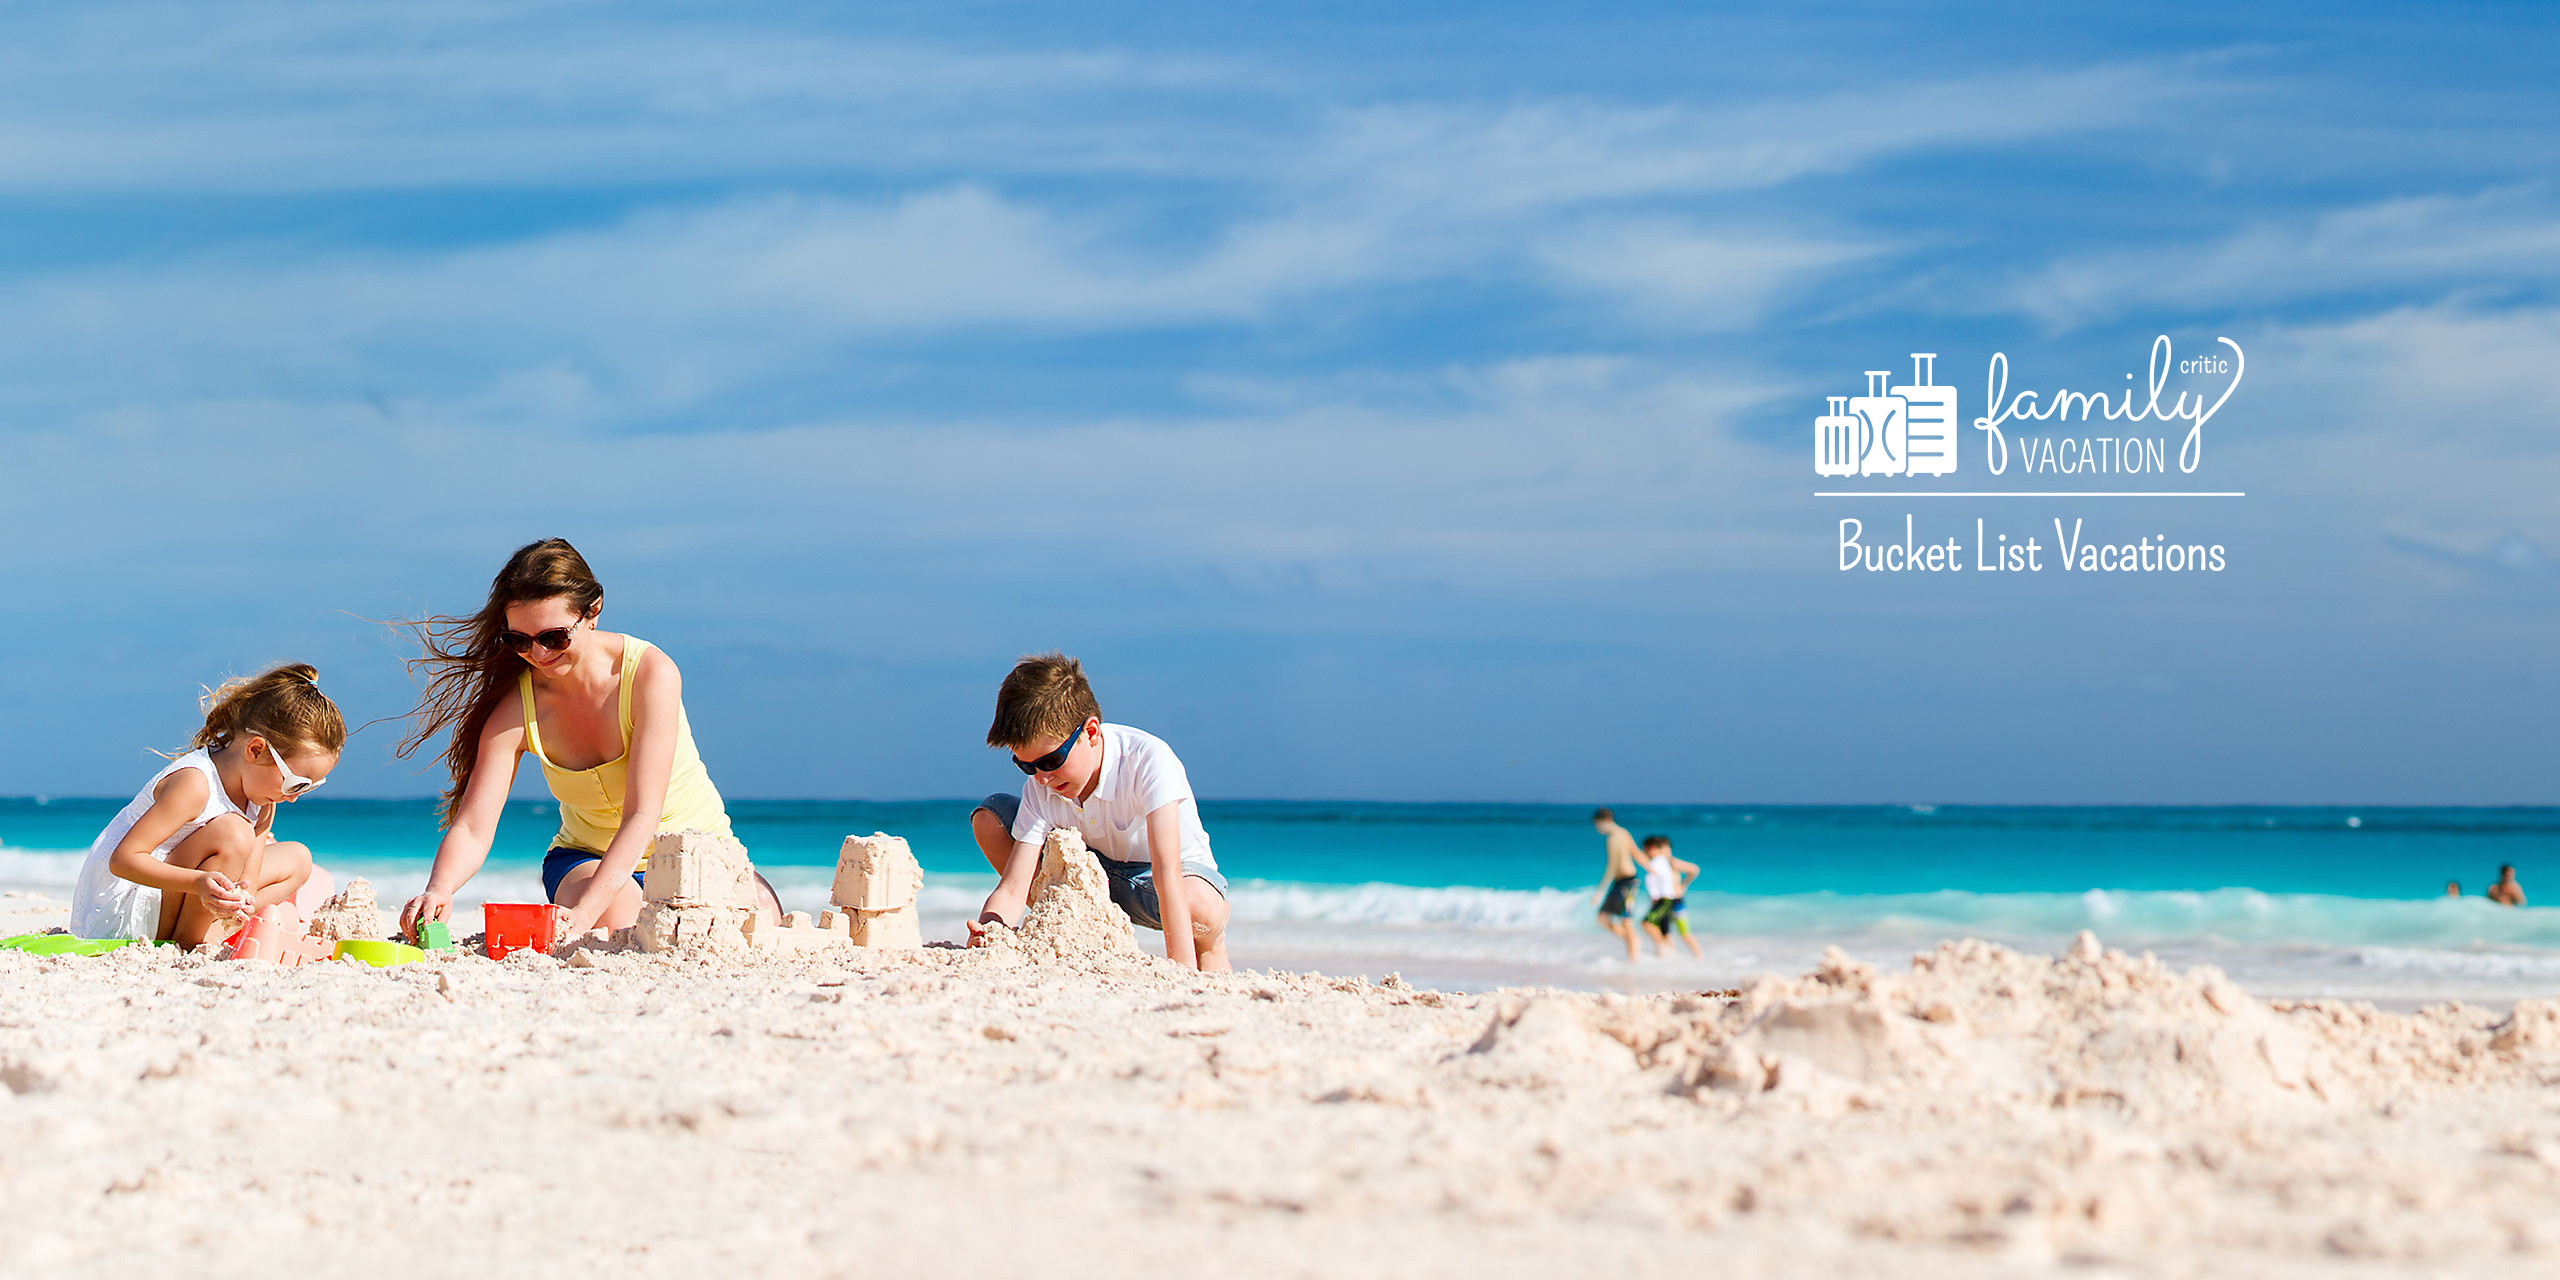 Mom and Kids on Beach; Courtesy of BlueOrange Studio/Shutterstock.com